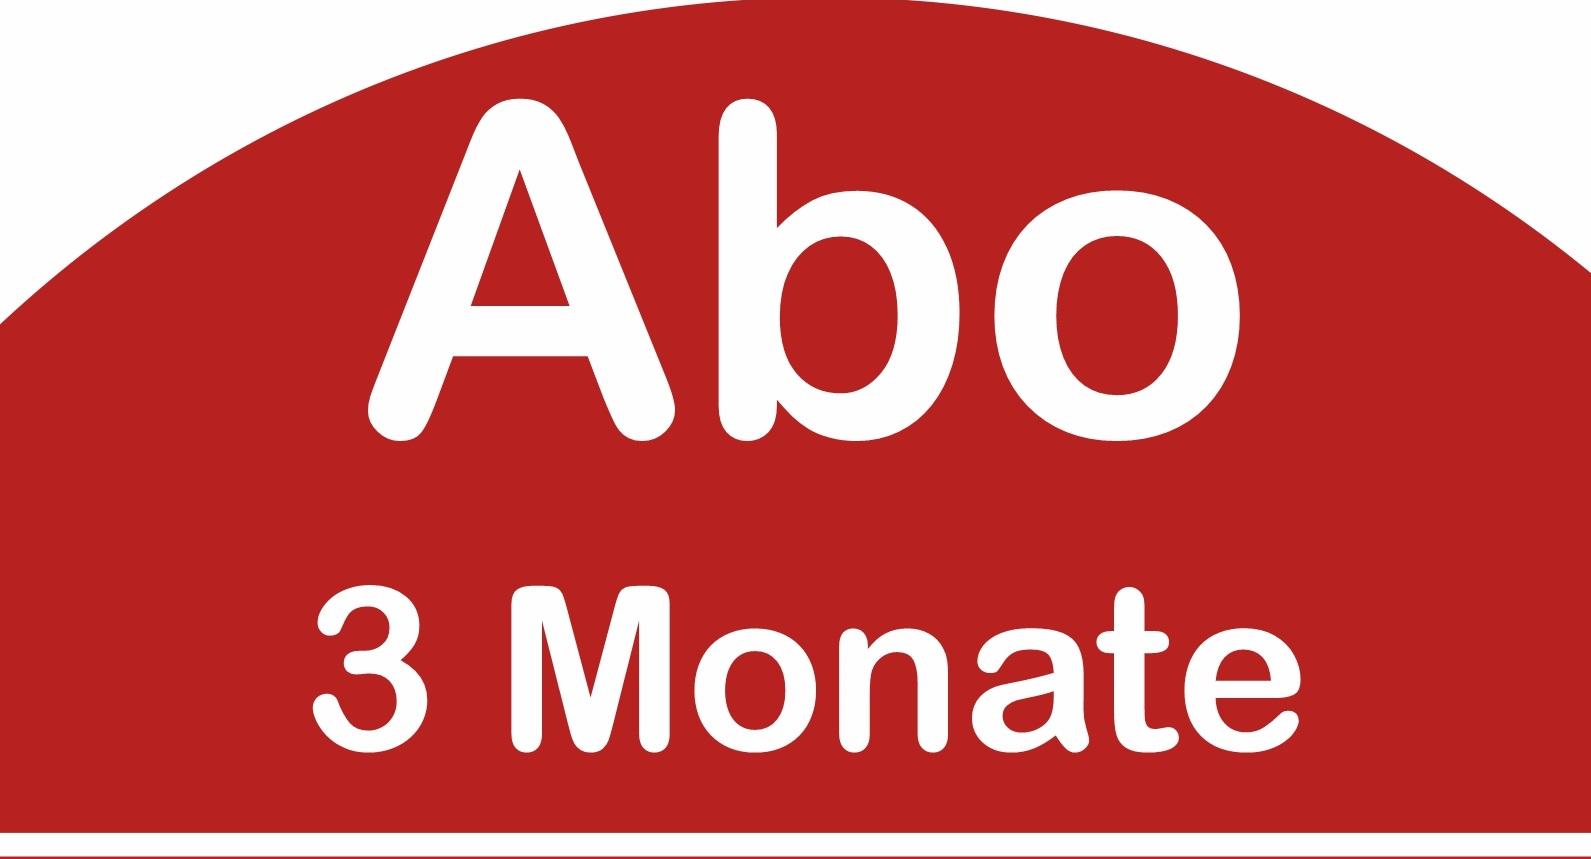 Abo 3 Monate für Jonglier-Fortgeschrittene